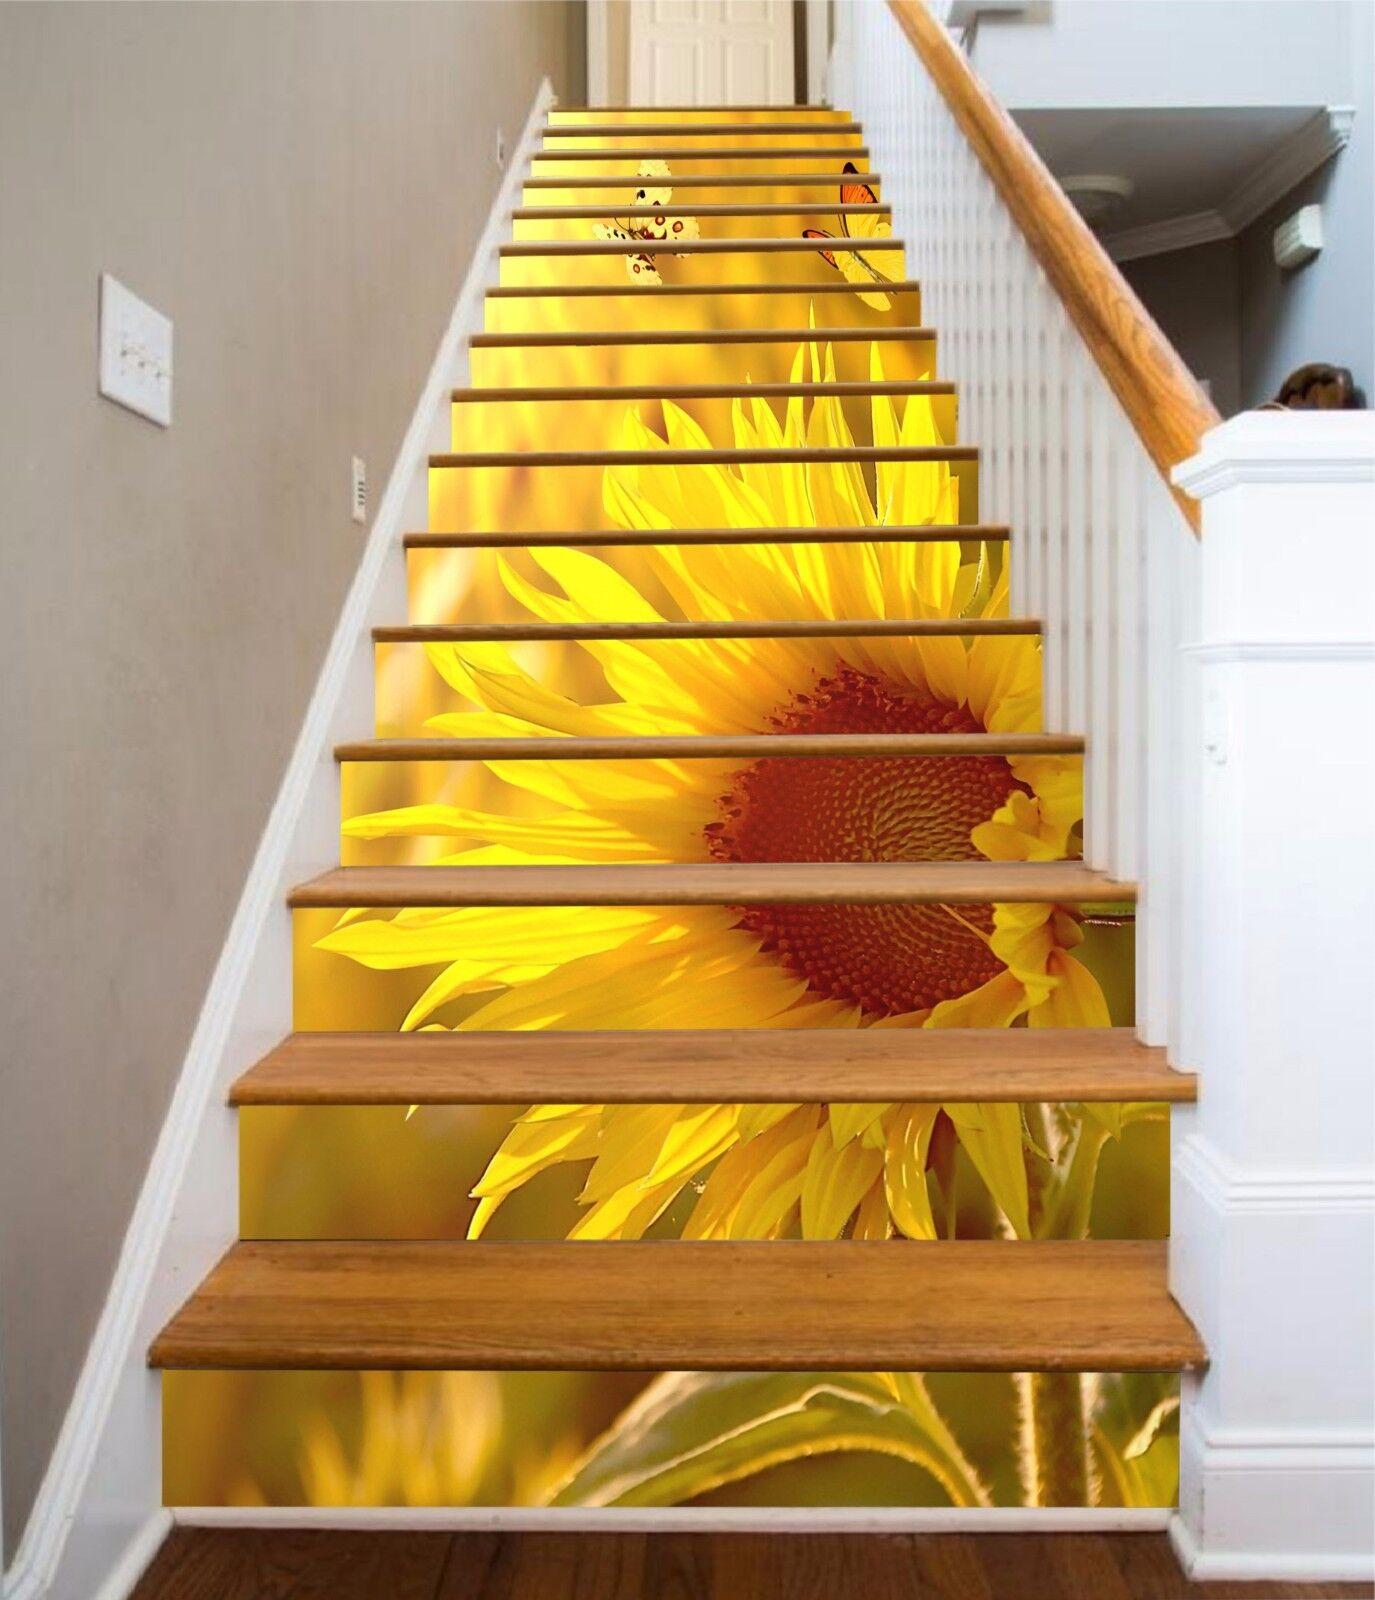 3D Sunflower 537 Stair Risers Decoration Photo Mural Vinyl Decal Wallpaper AU